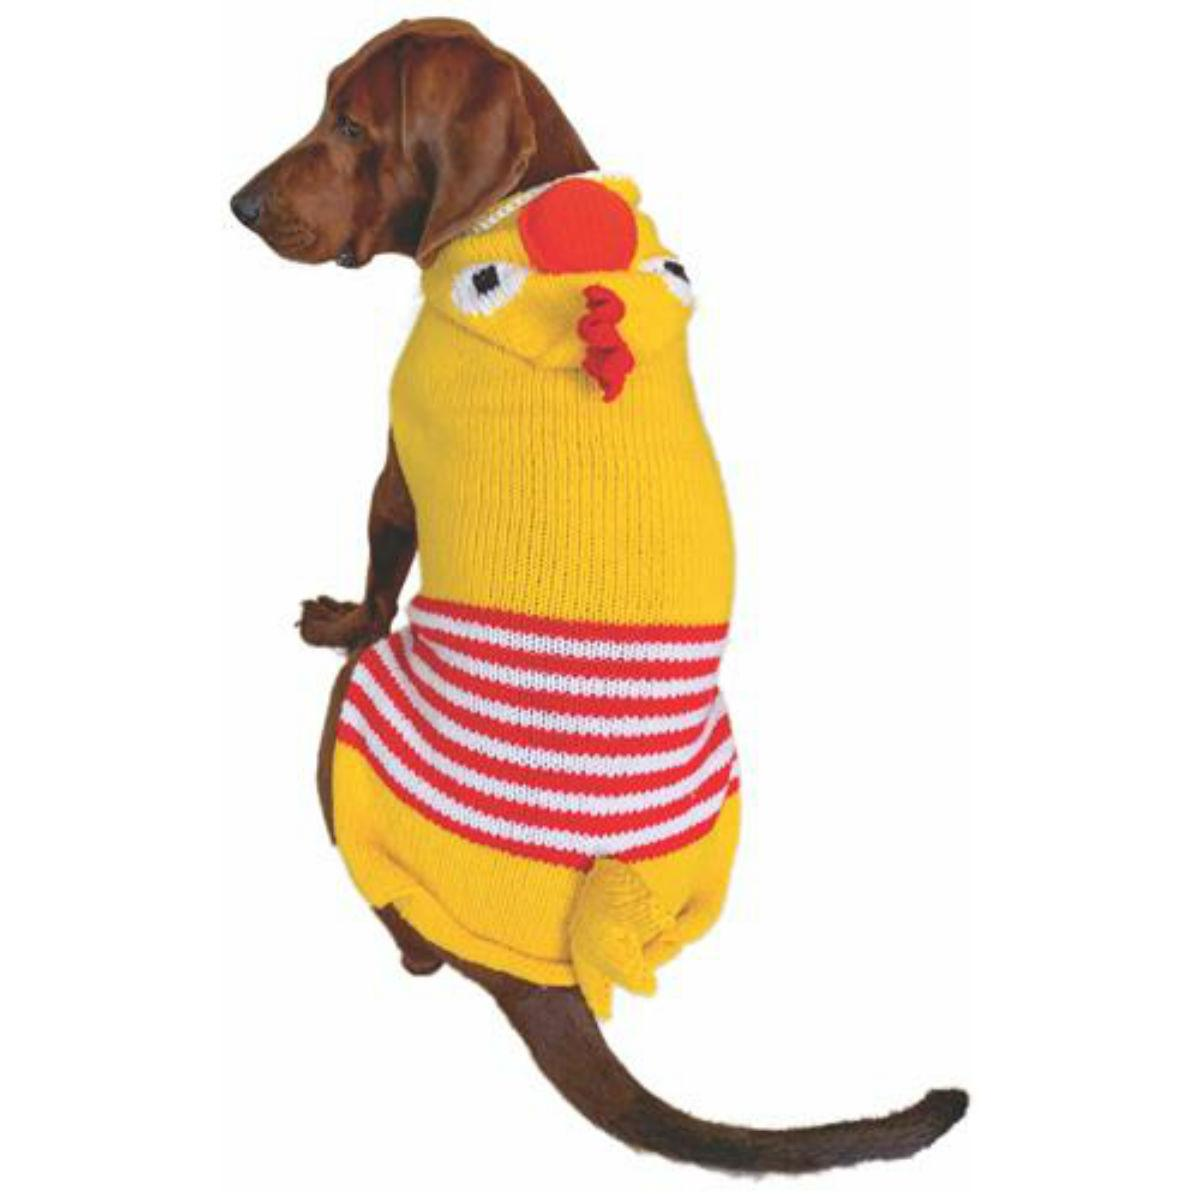 Handmade Chicken Hooded Wool Dog Sweater